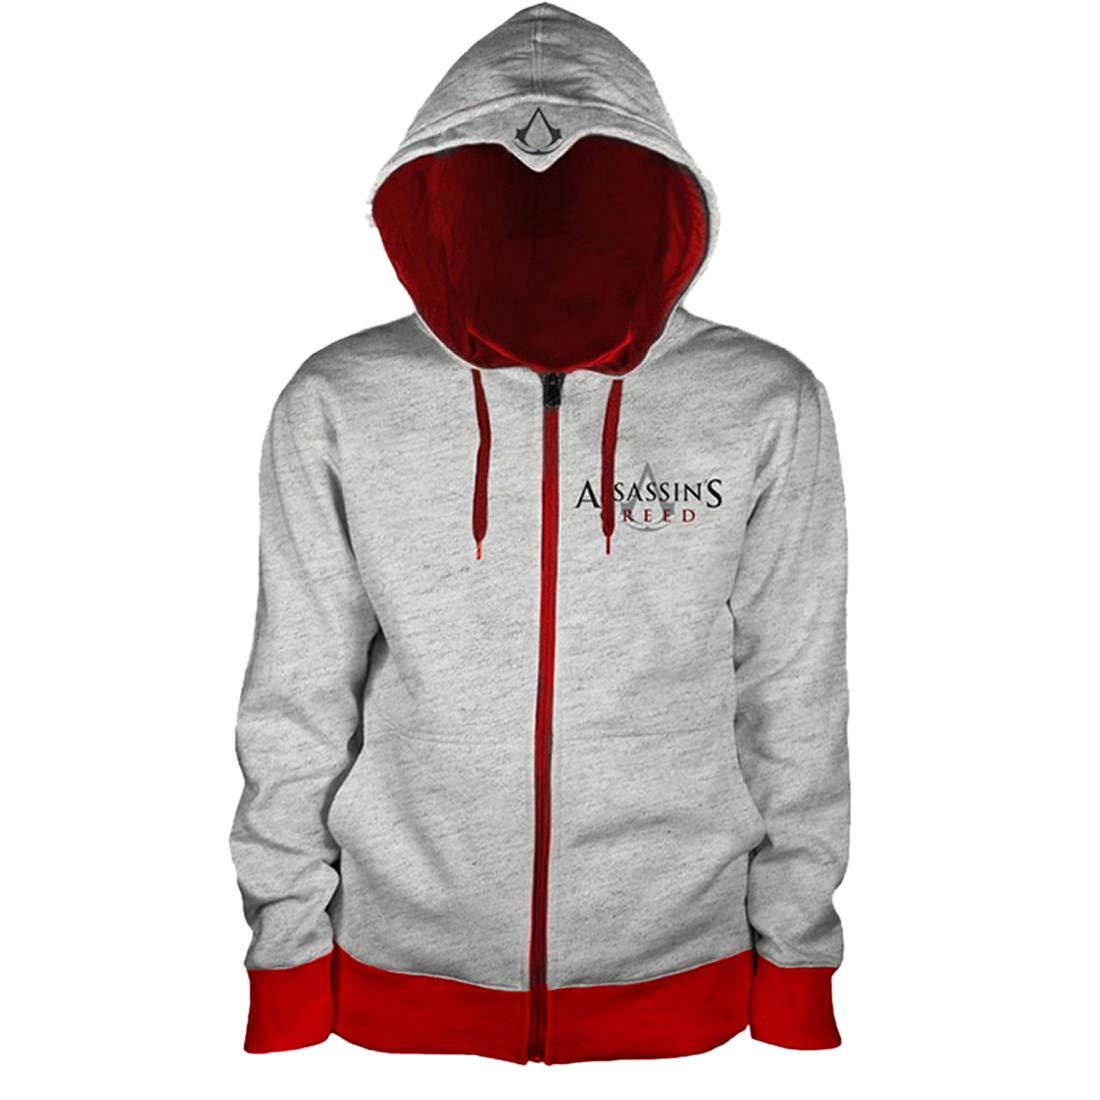 100/% Syndicate Full Zip Mens Sweatshirt Jacket Fleece Hoodies